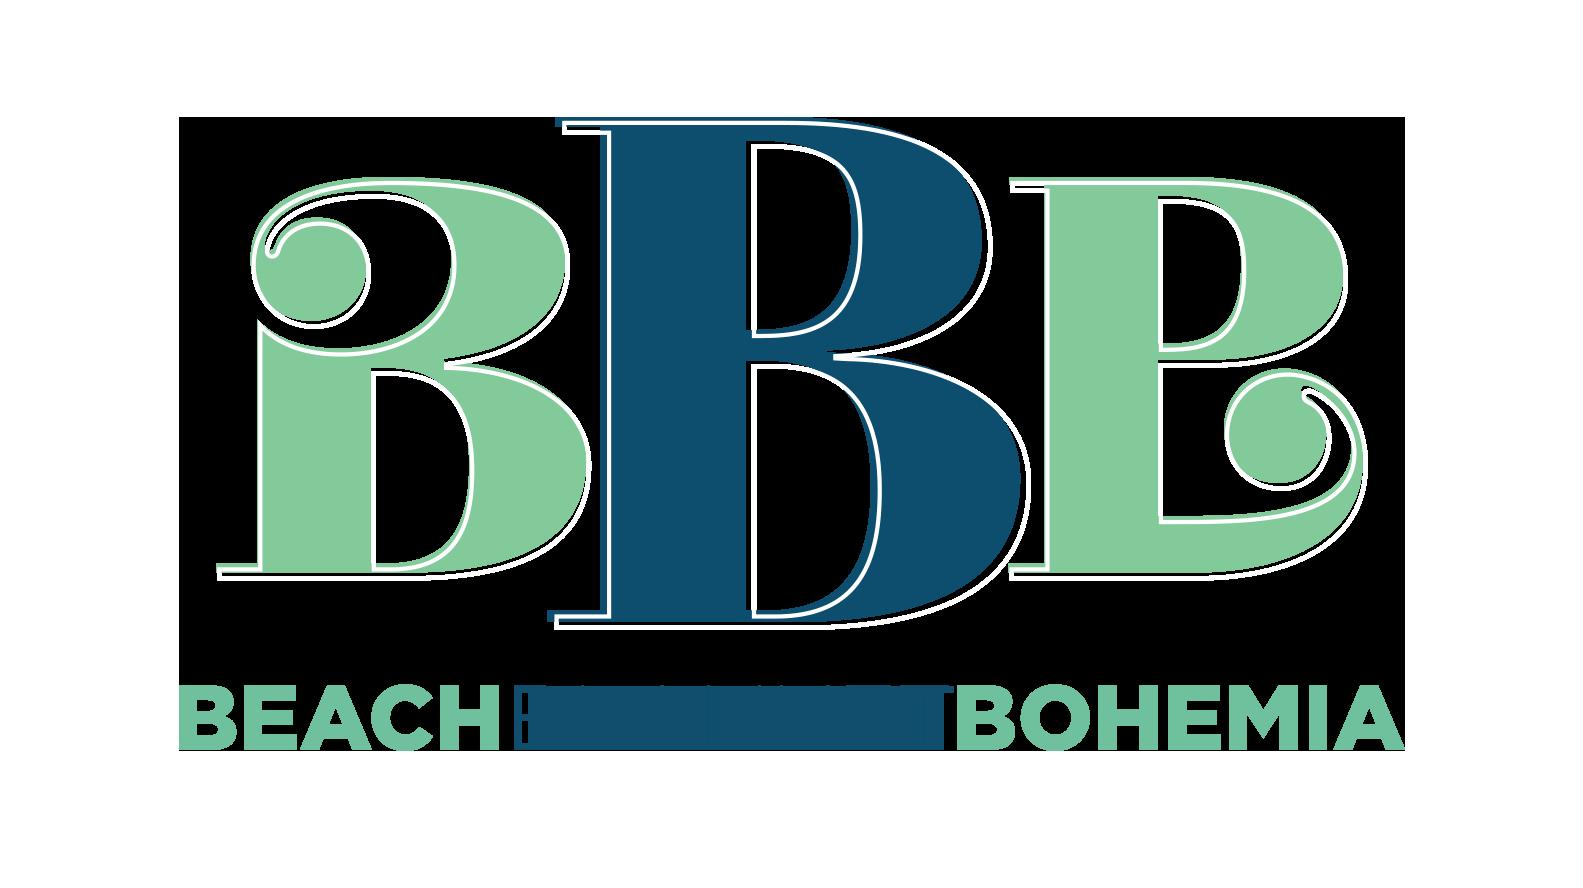 Beach Blanket Bohemia